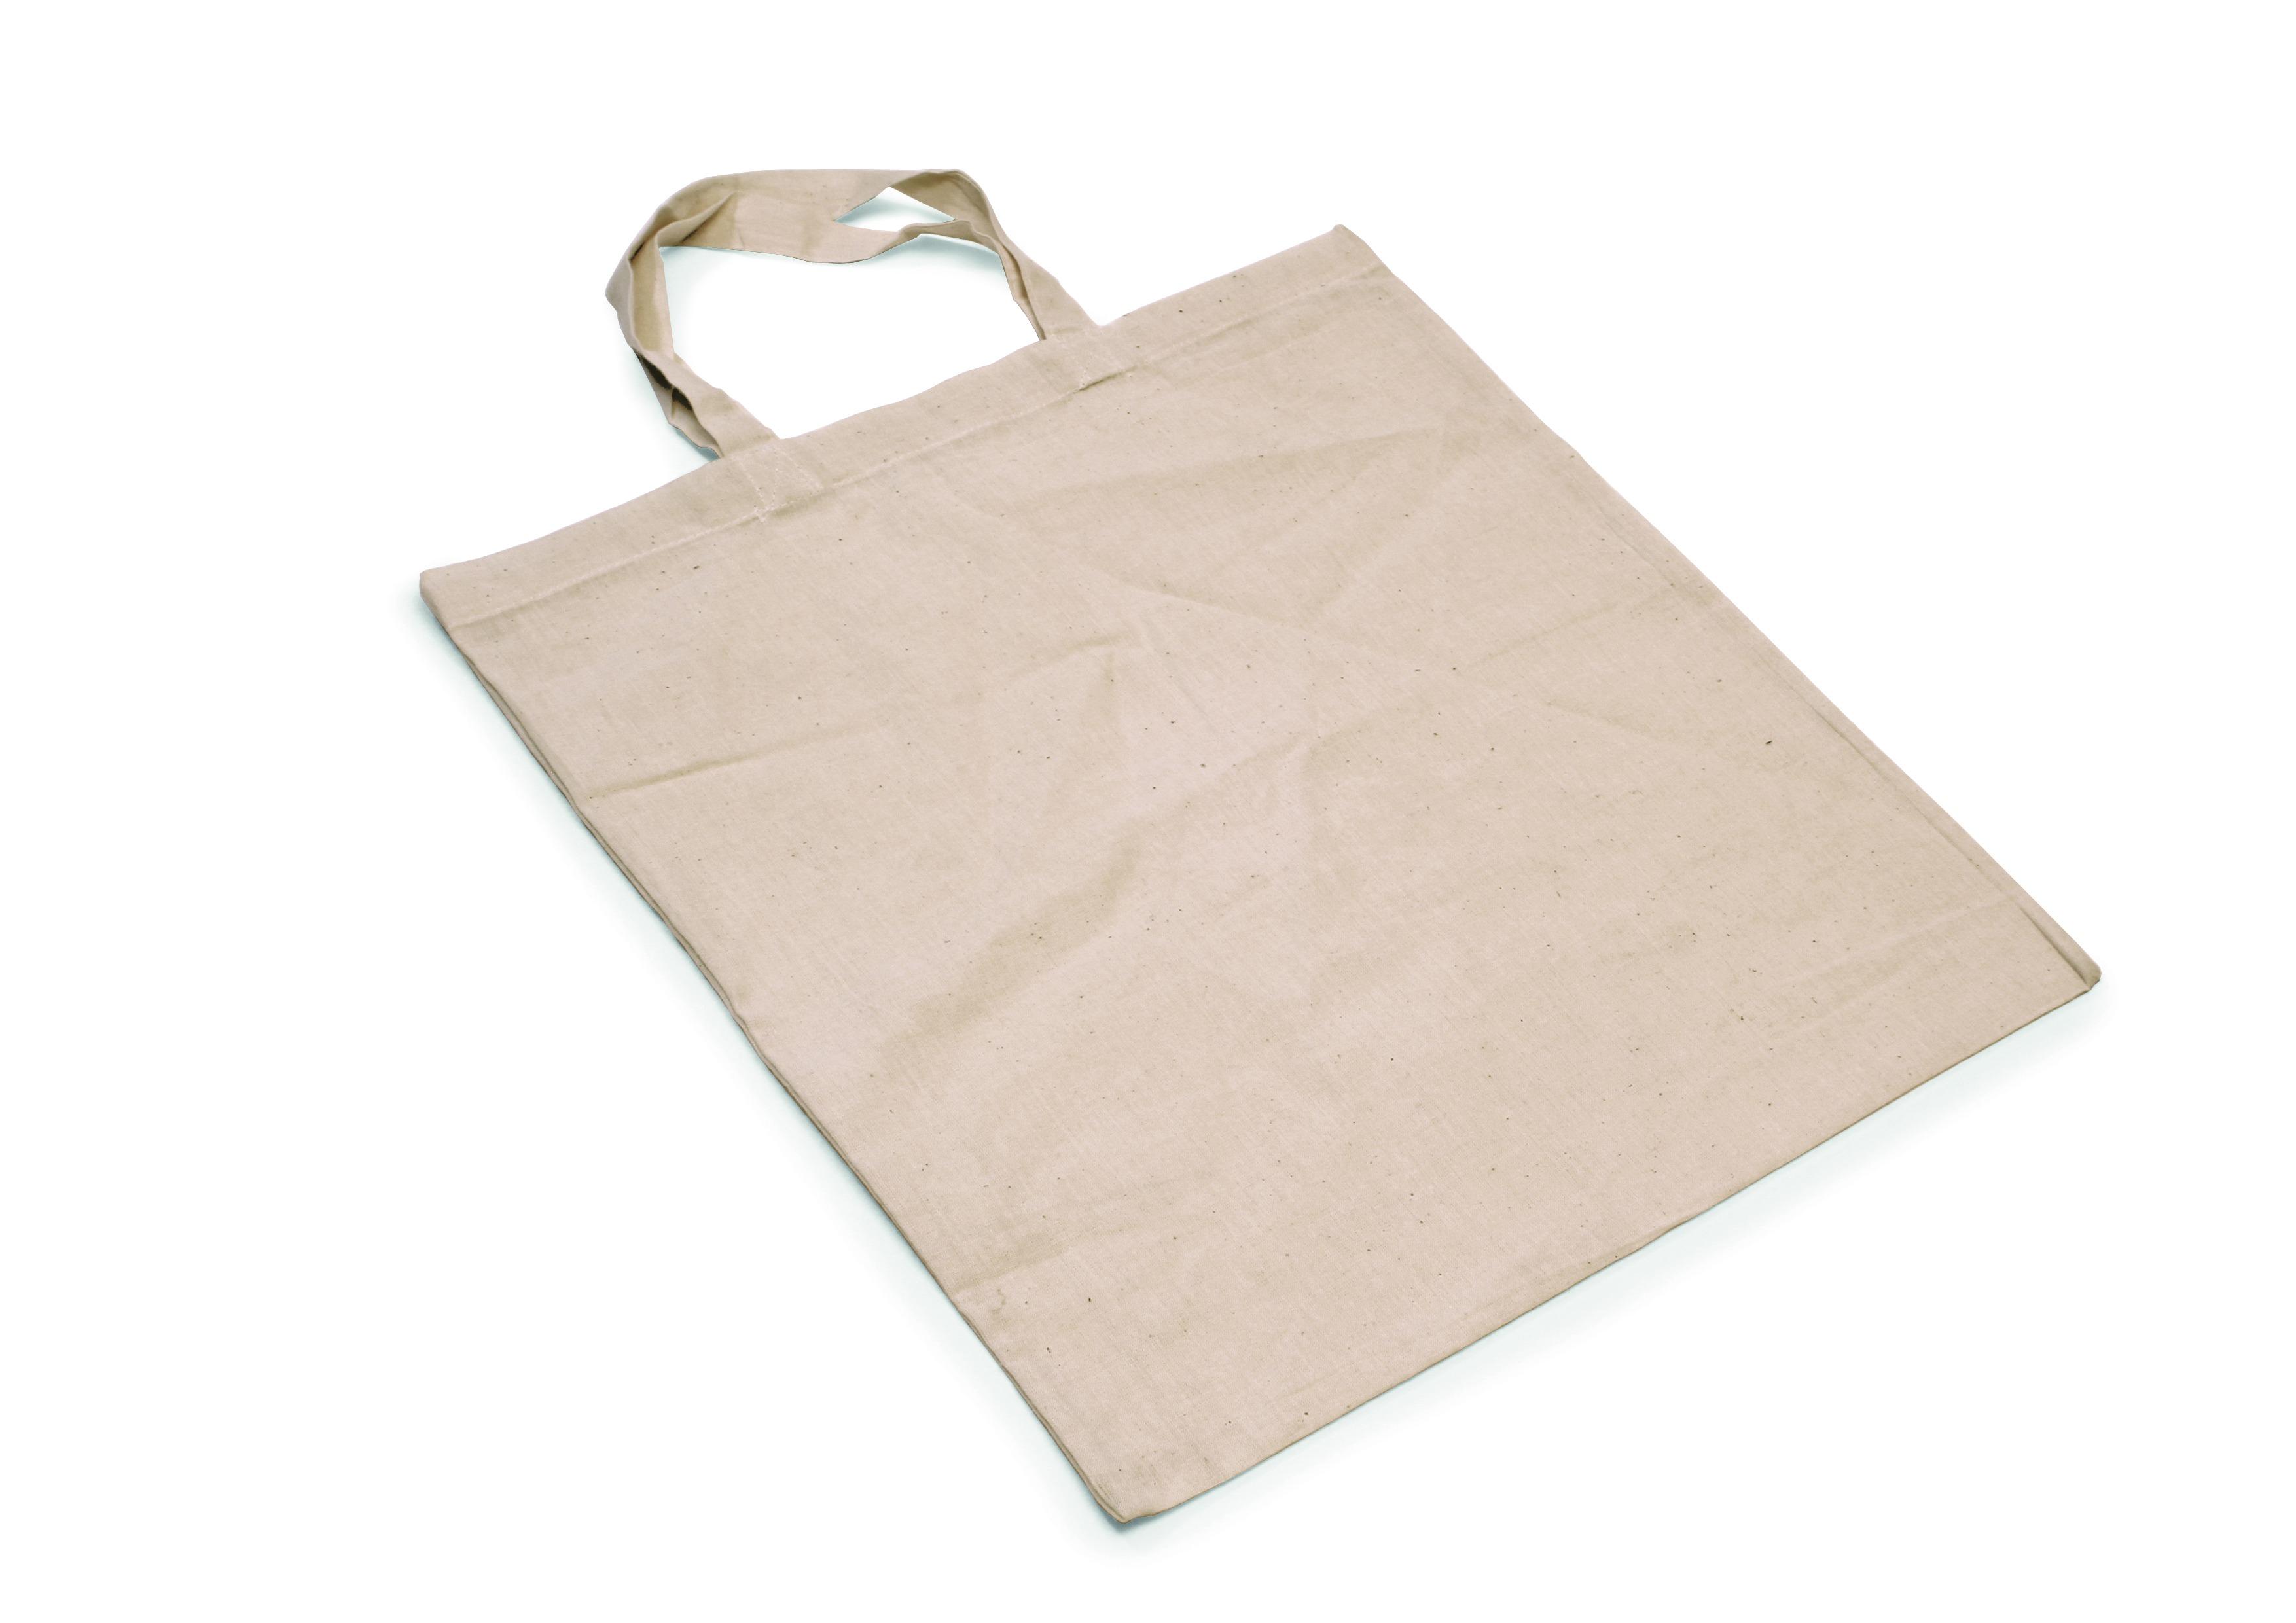 tote-bag-1465822277.jpg